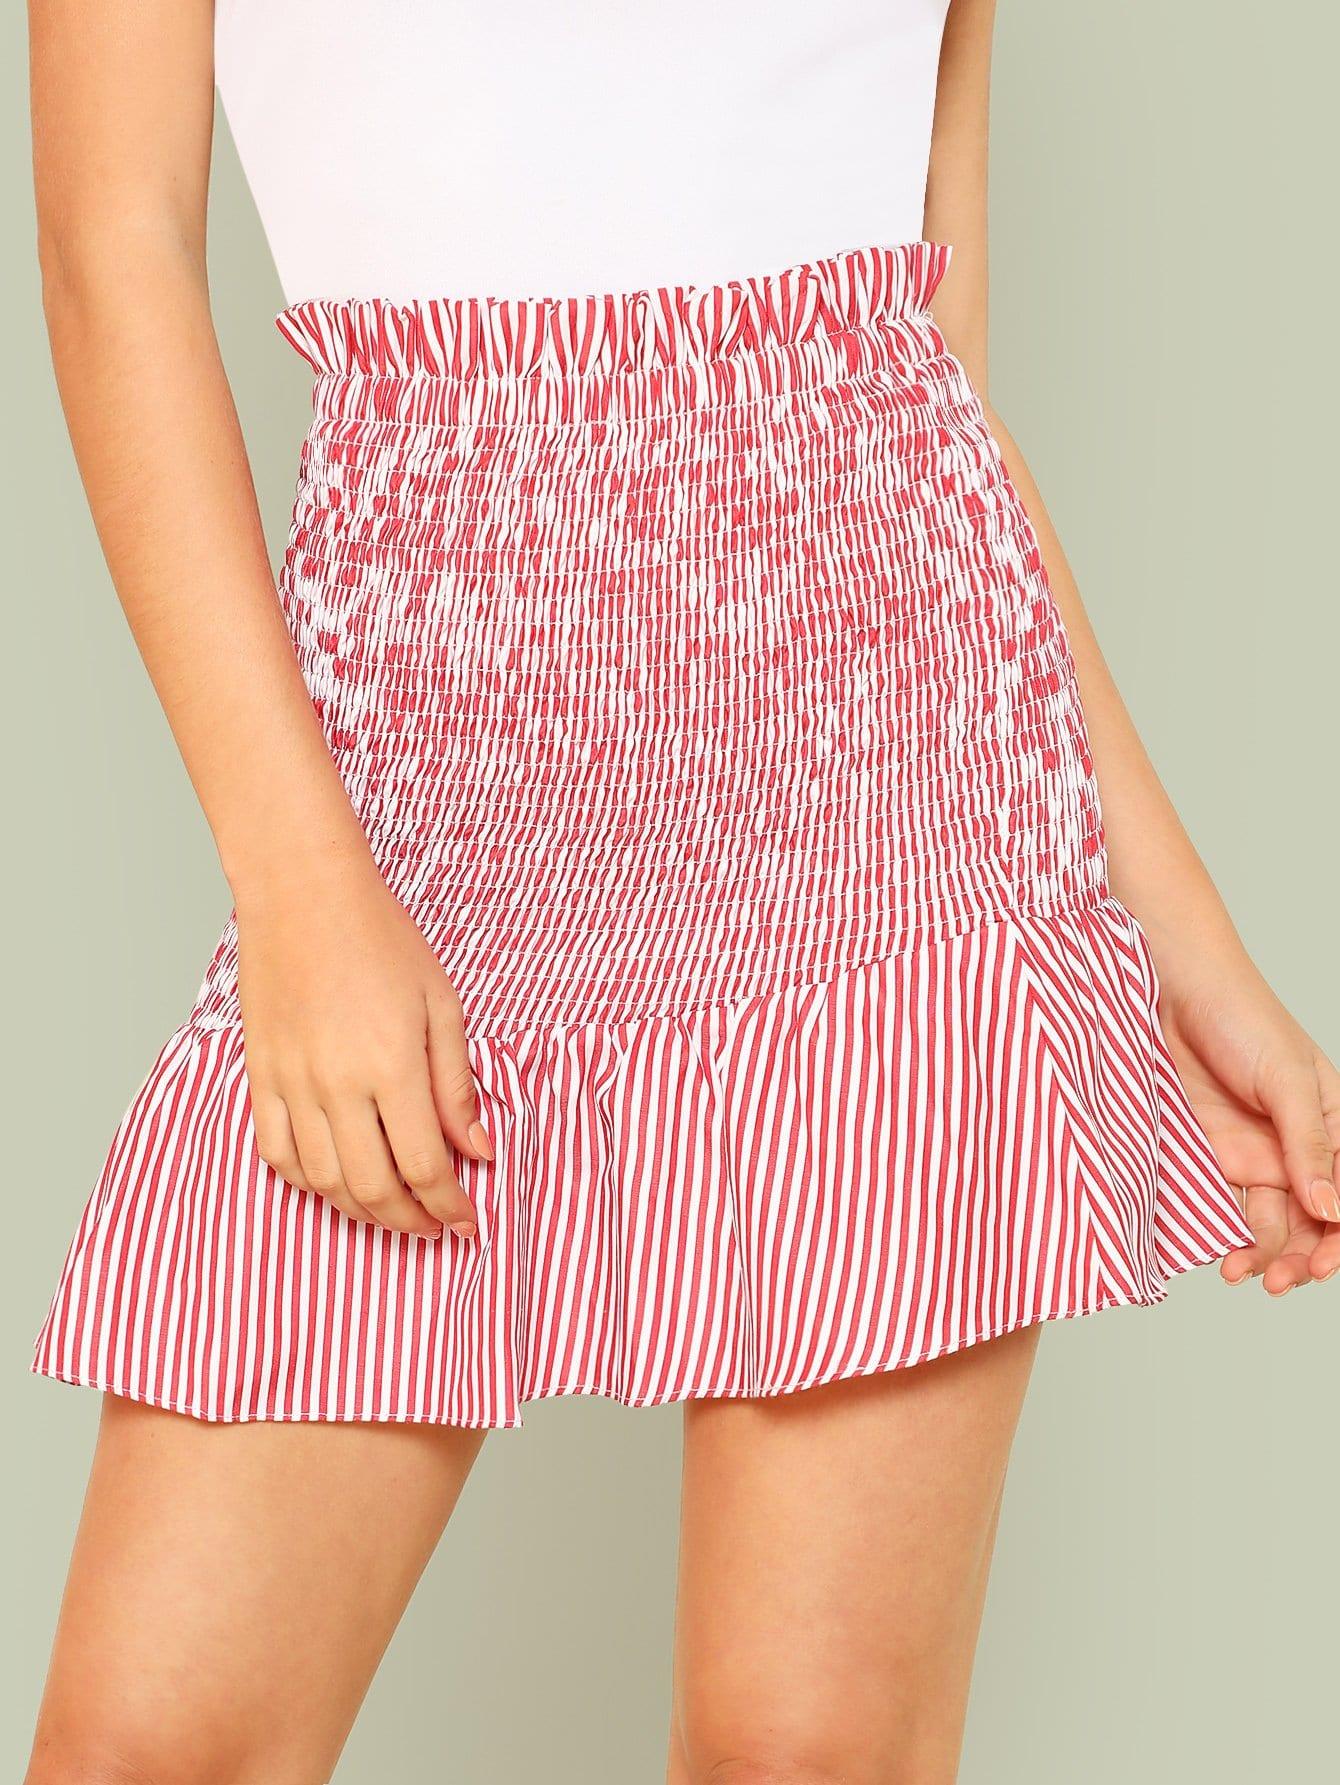 Shirred Panel Asymmetrical Ruffle Hem Skirt asymmetrical ruffle hem denim skirt